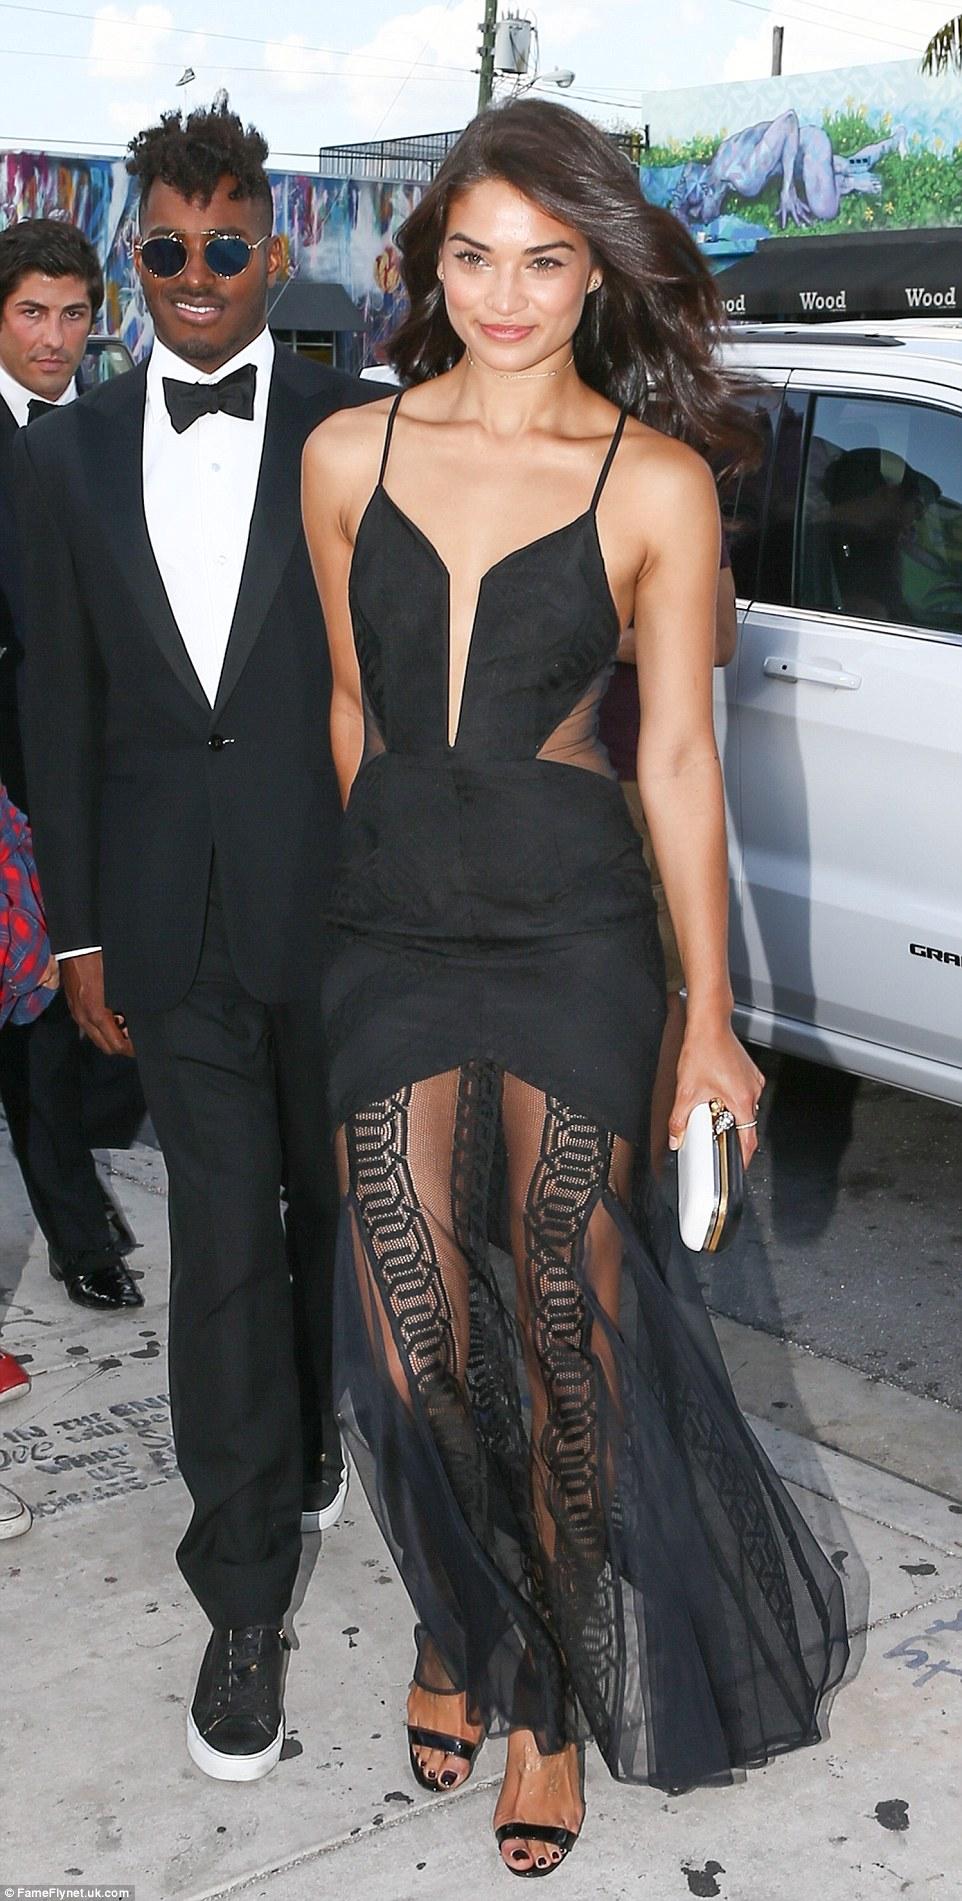 Model Shanina Shaik wore a slashed front black dress with a sheer mesh skirt